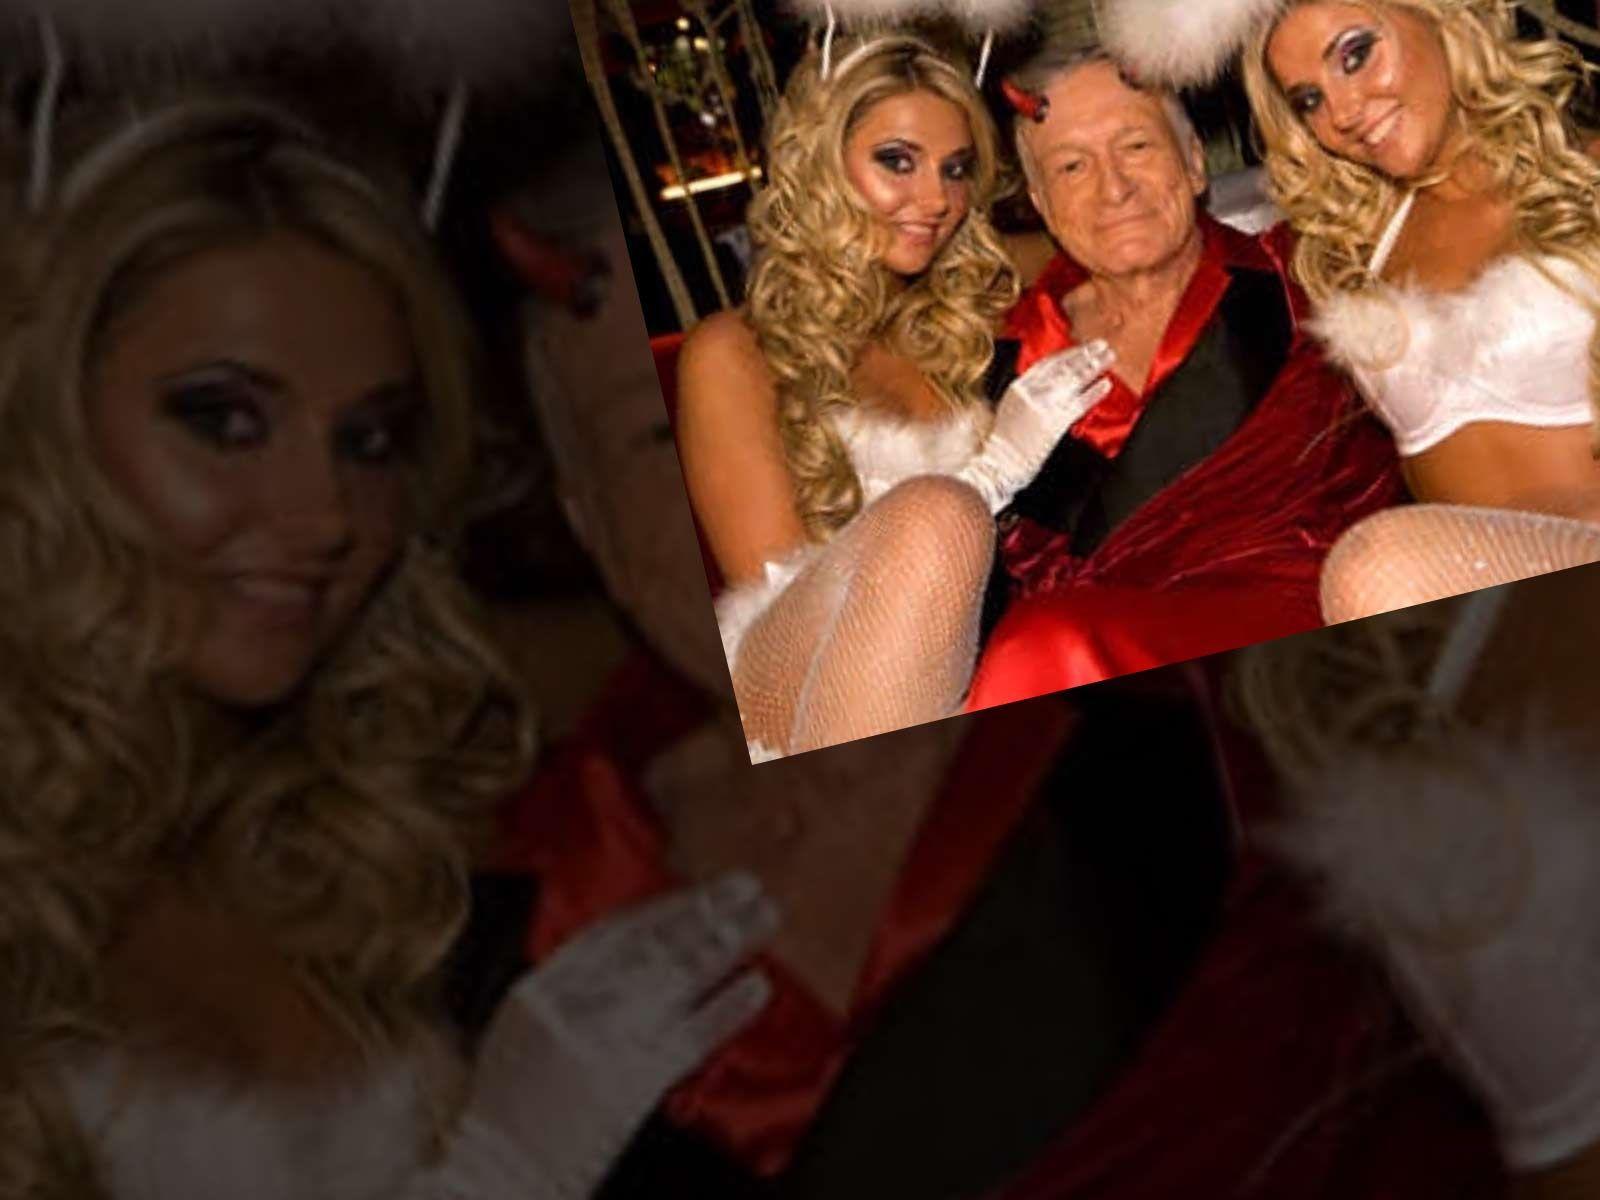 Hugh Hefner's twin girlfriends leave the mansion |Hugh Hefner Twin Girlfriends